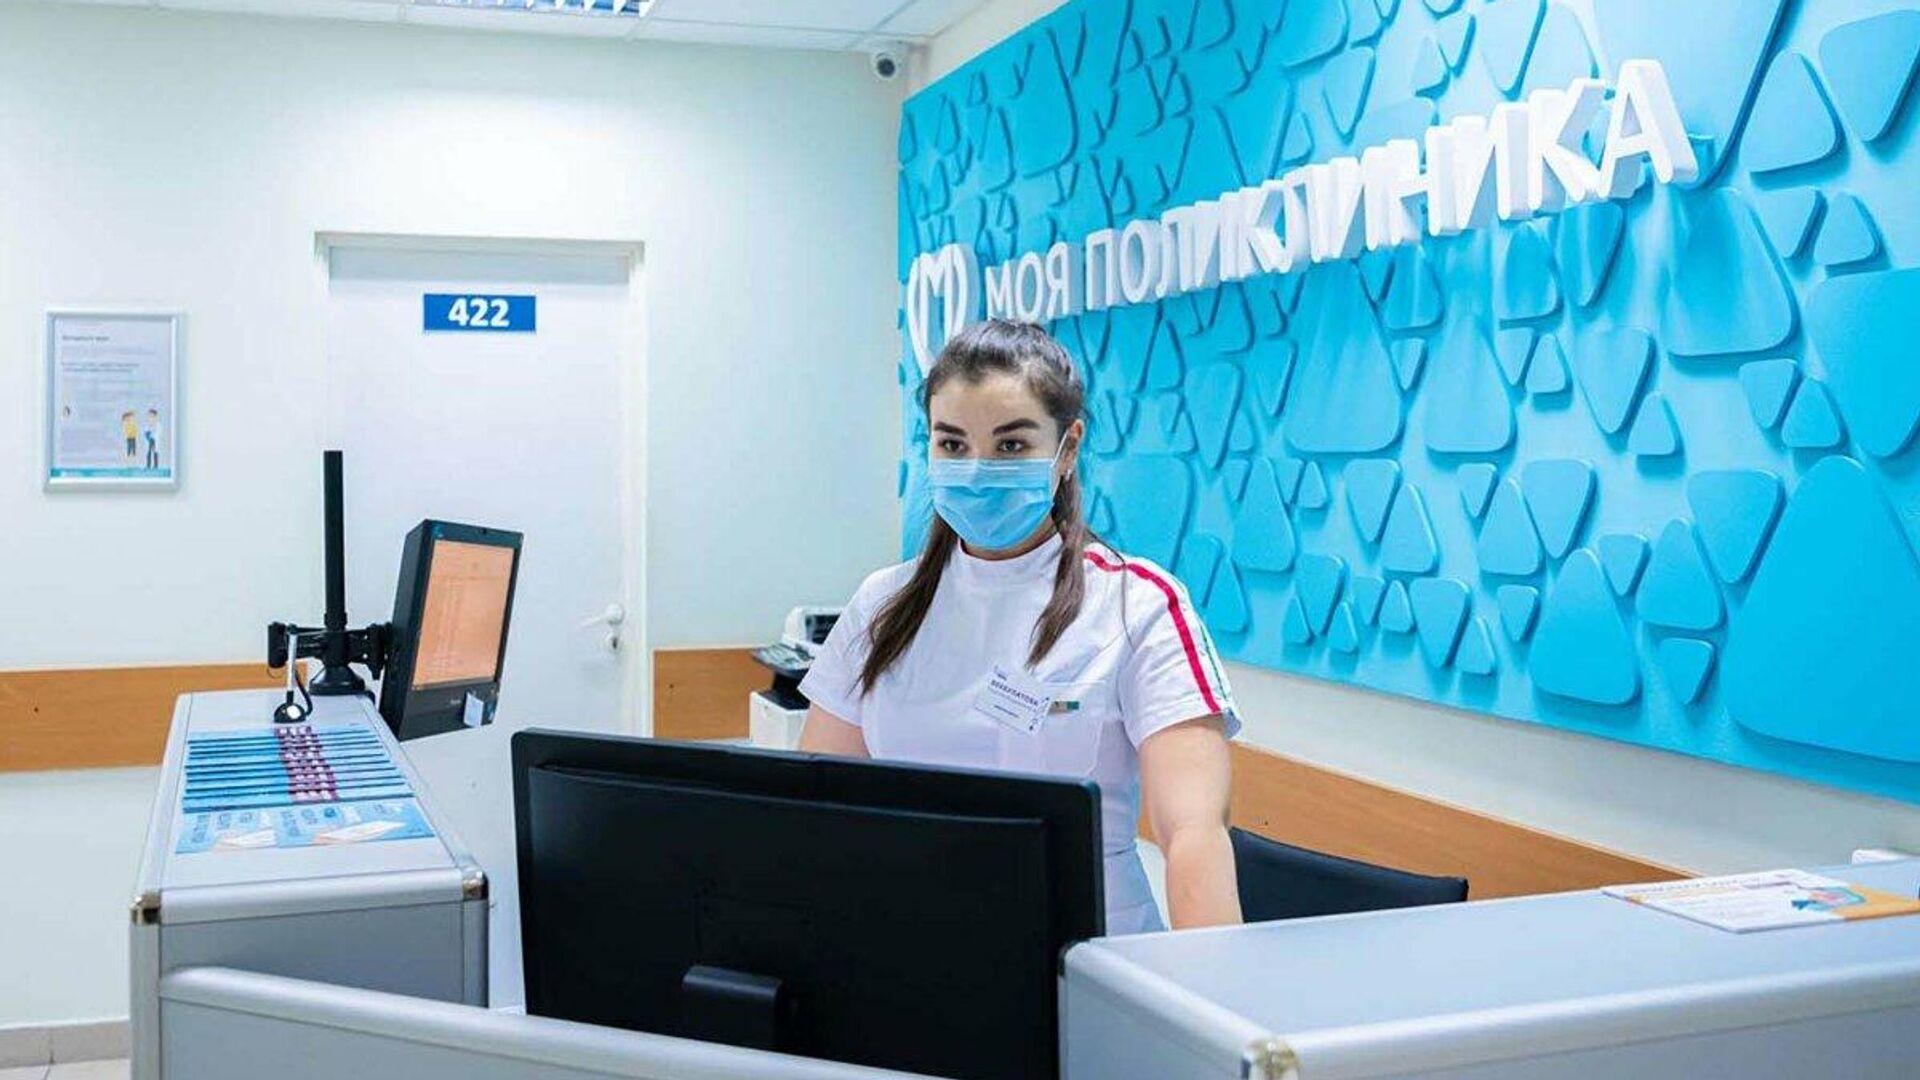 Una clínica en Moscú - Sputnik Mundo, 1920, 09.09.2021